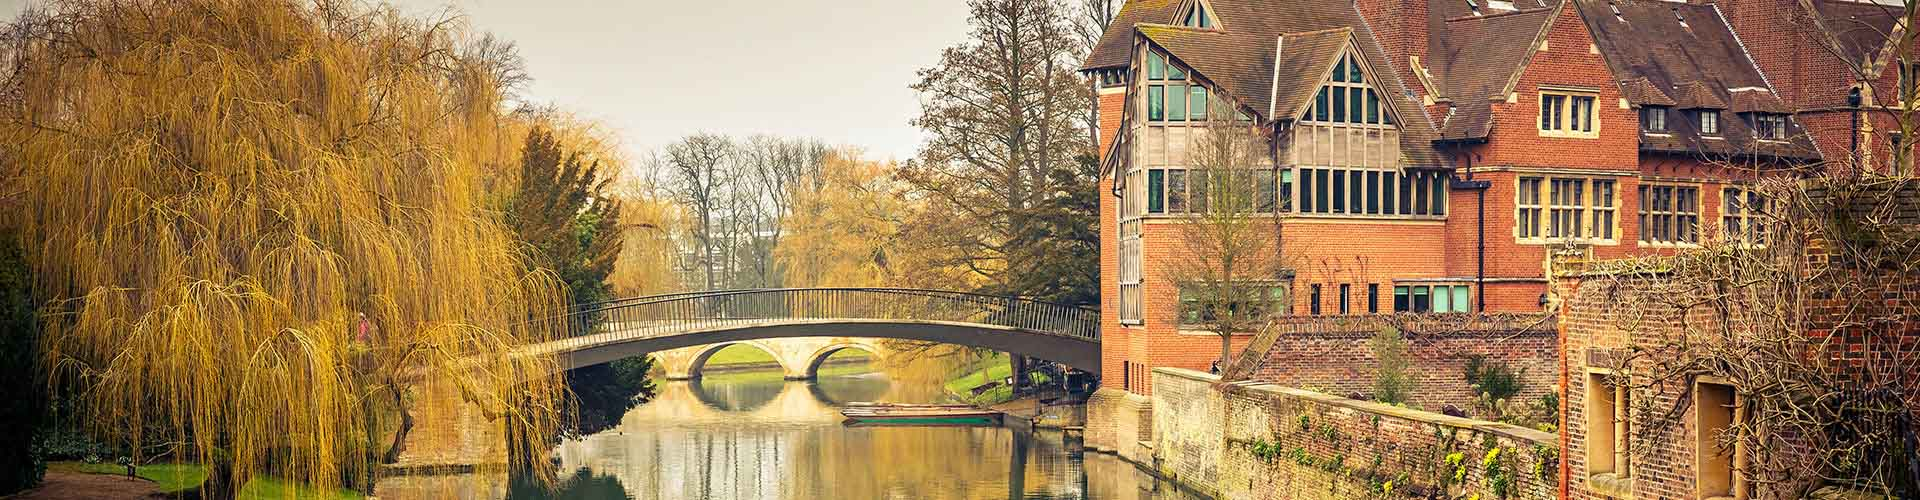 Cambridge - pokoje v Cambridge. Mapy pro Cambridge, fotky a recenze pro každý pokoj - Cambridge.